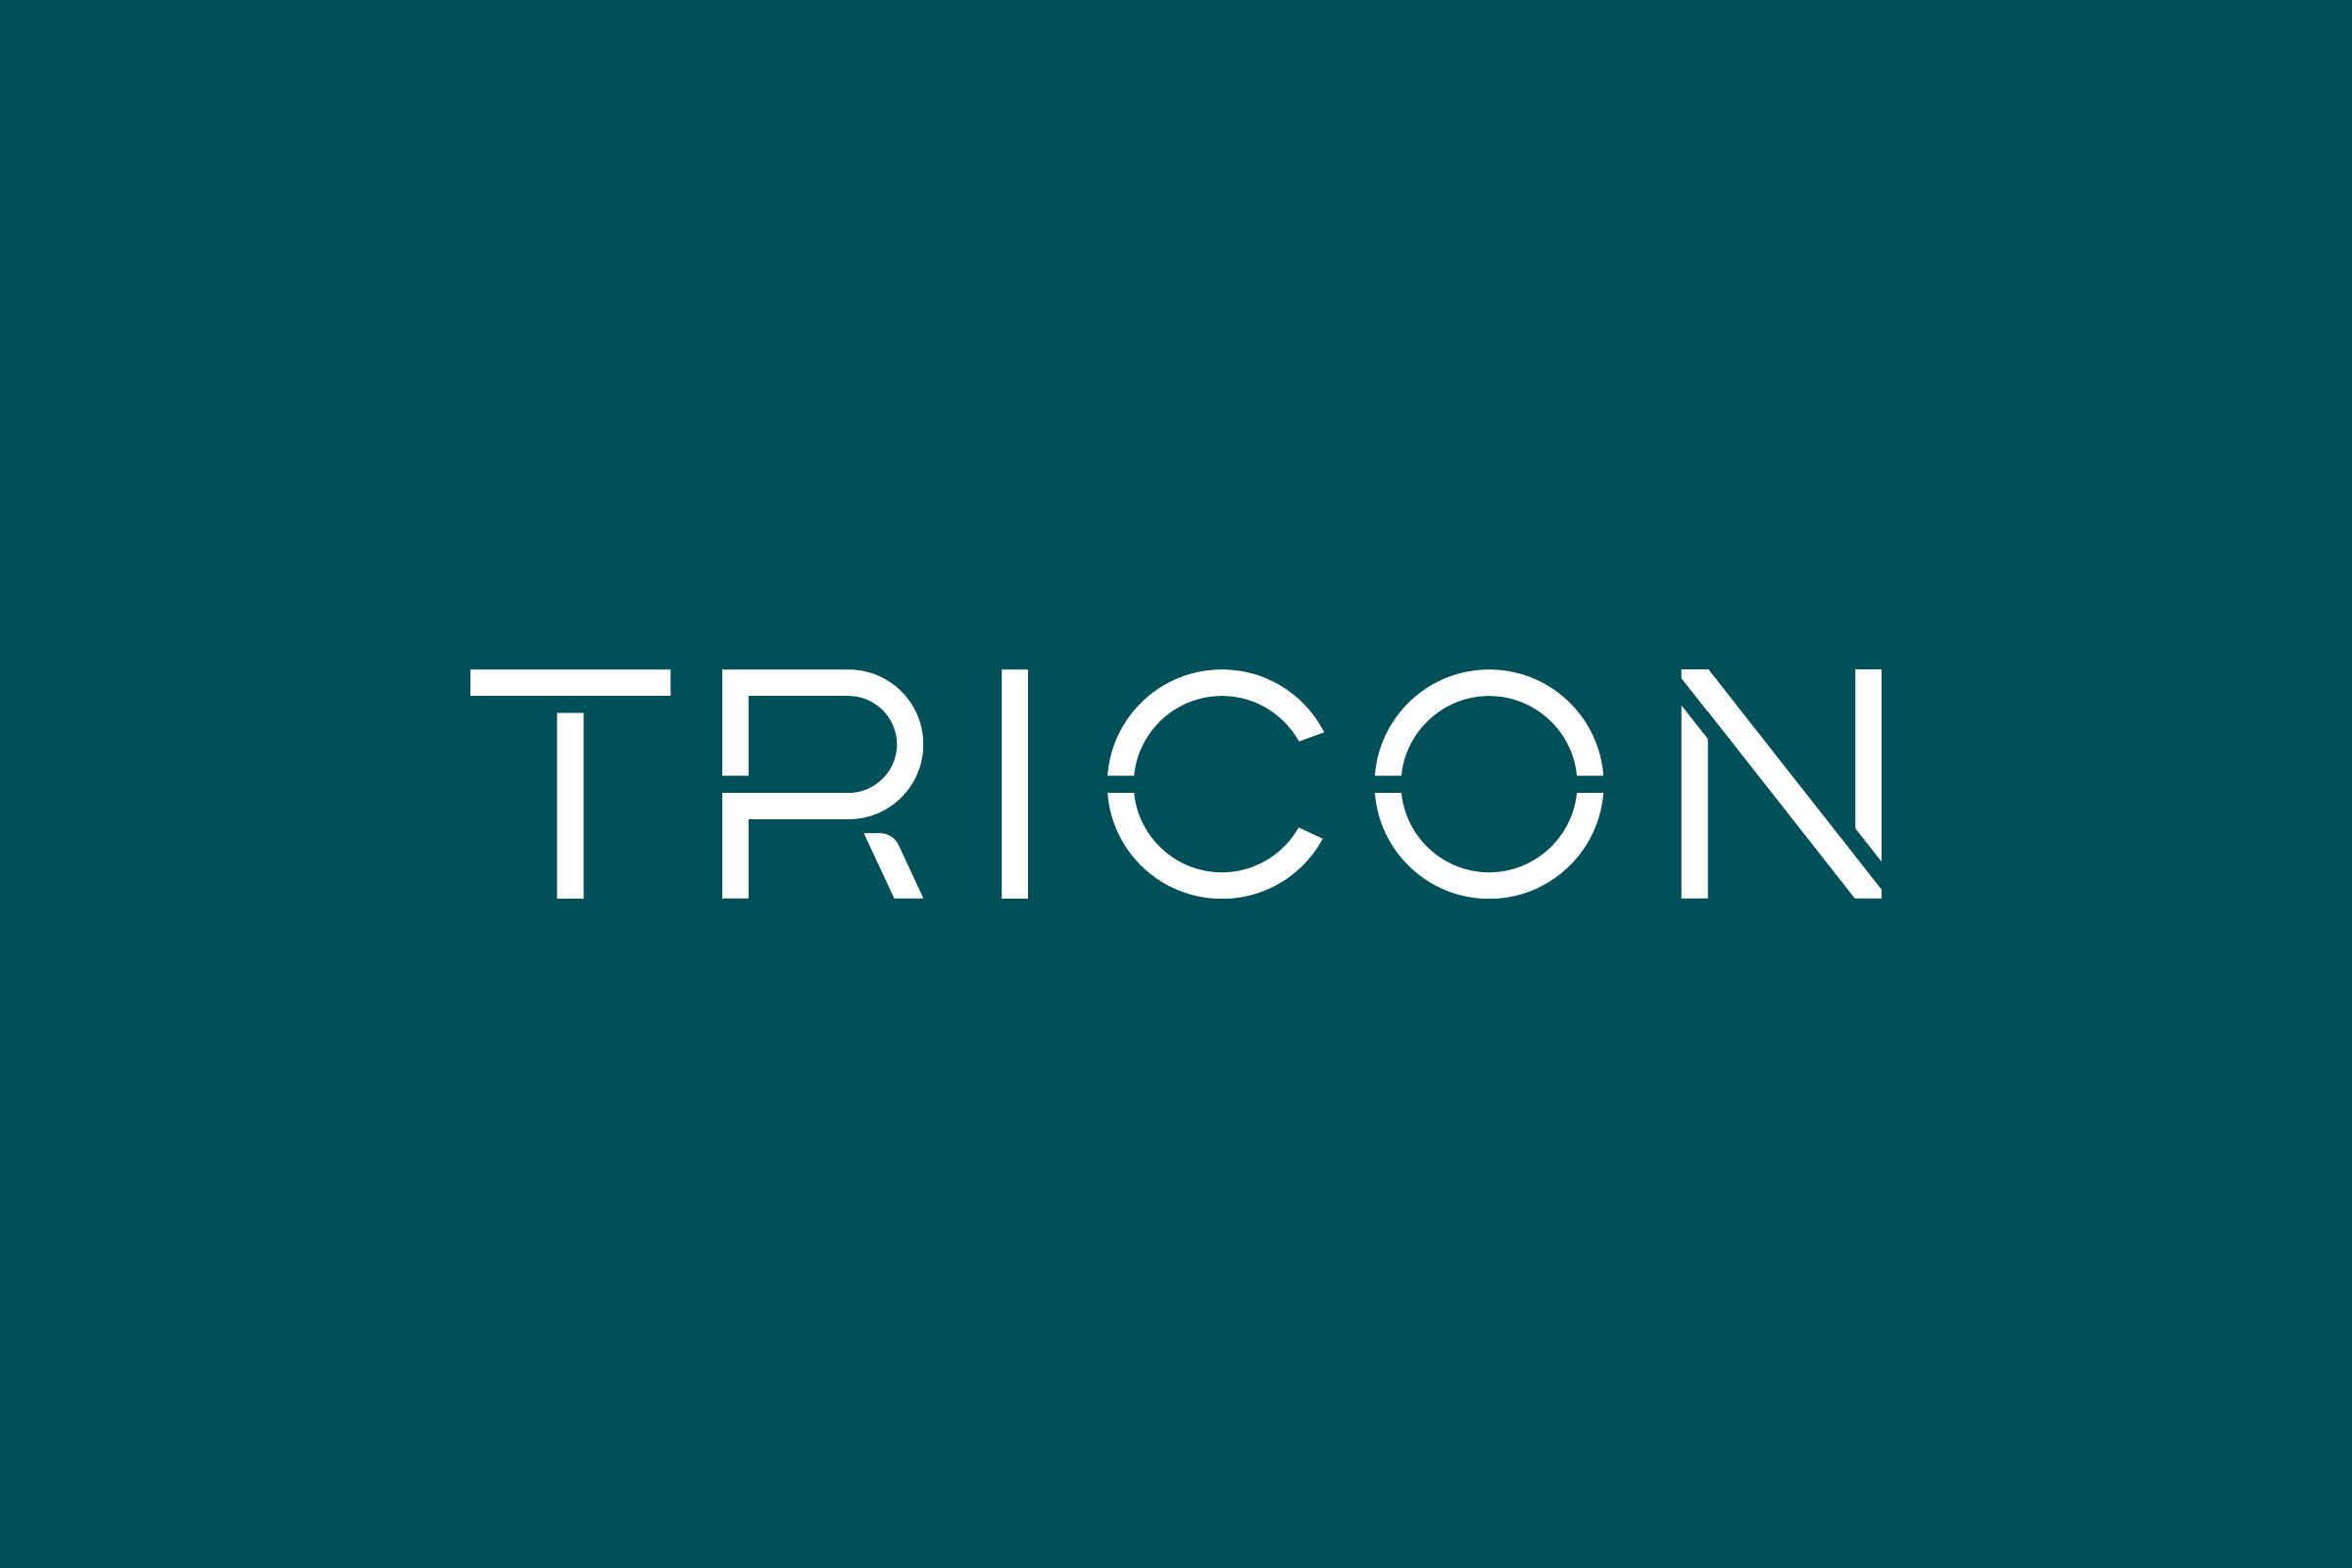 Tricon-01.jpg